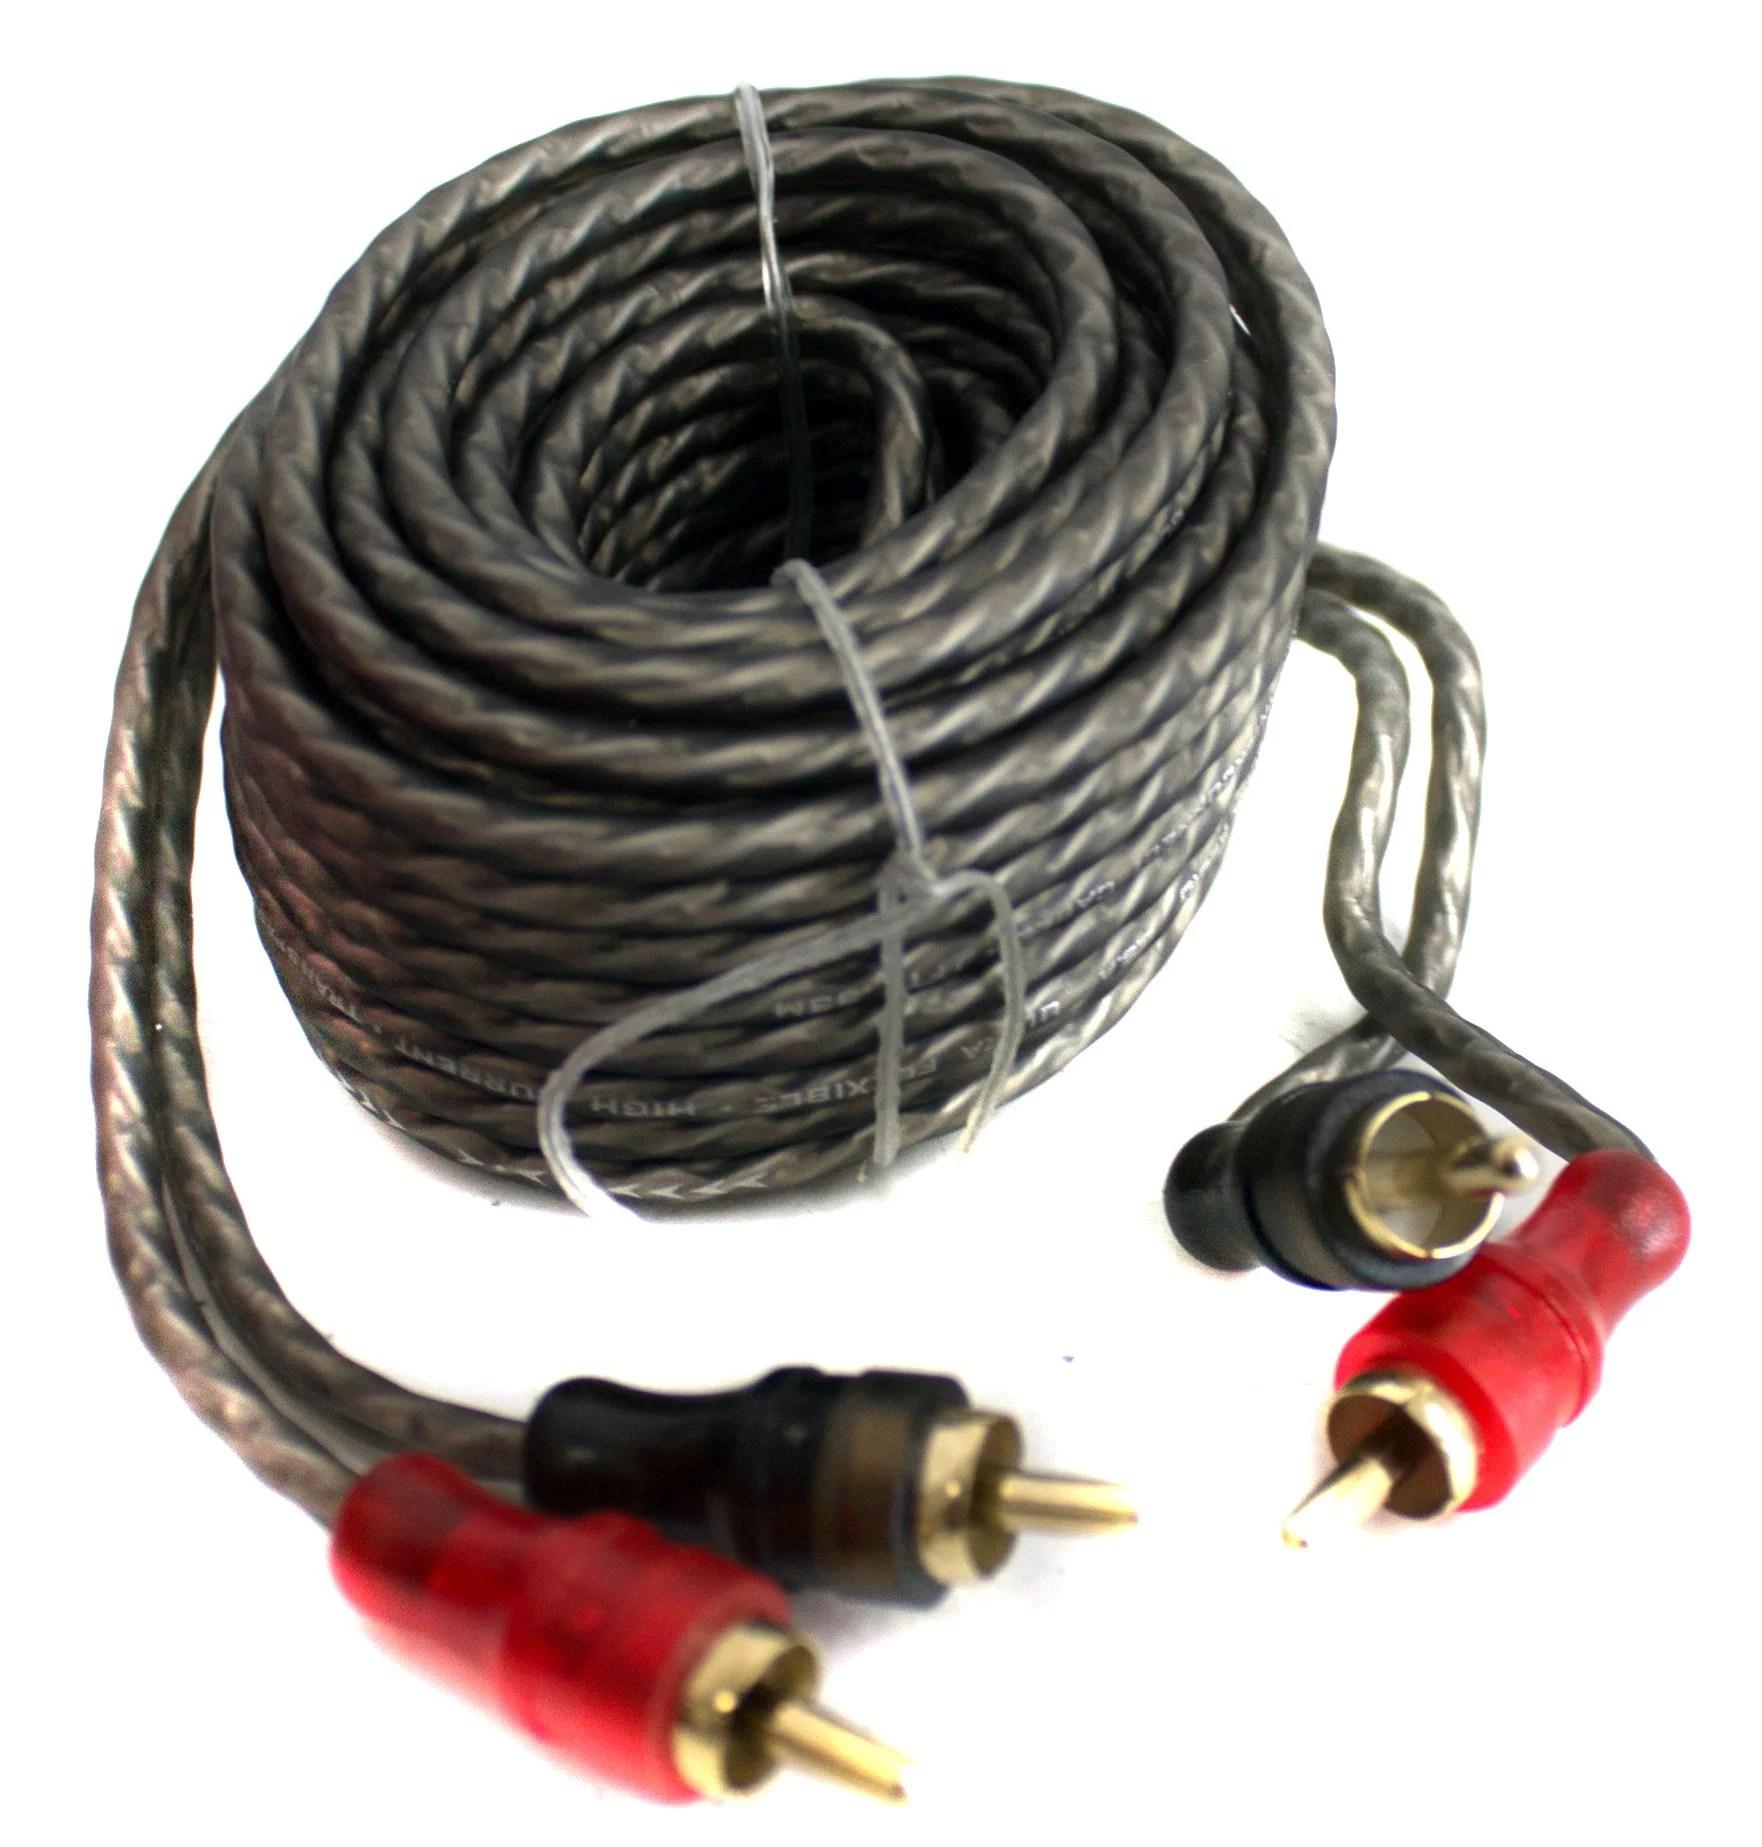 medium resolution of bullz audio 4 gauge 3000w professional car amplifier wiring amp kit red bpe4r walmart canada